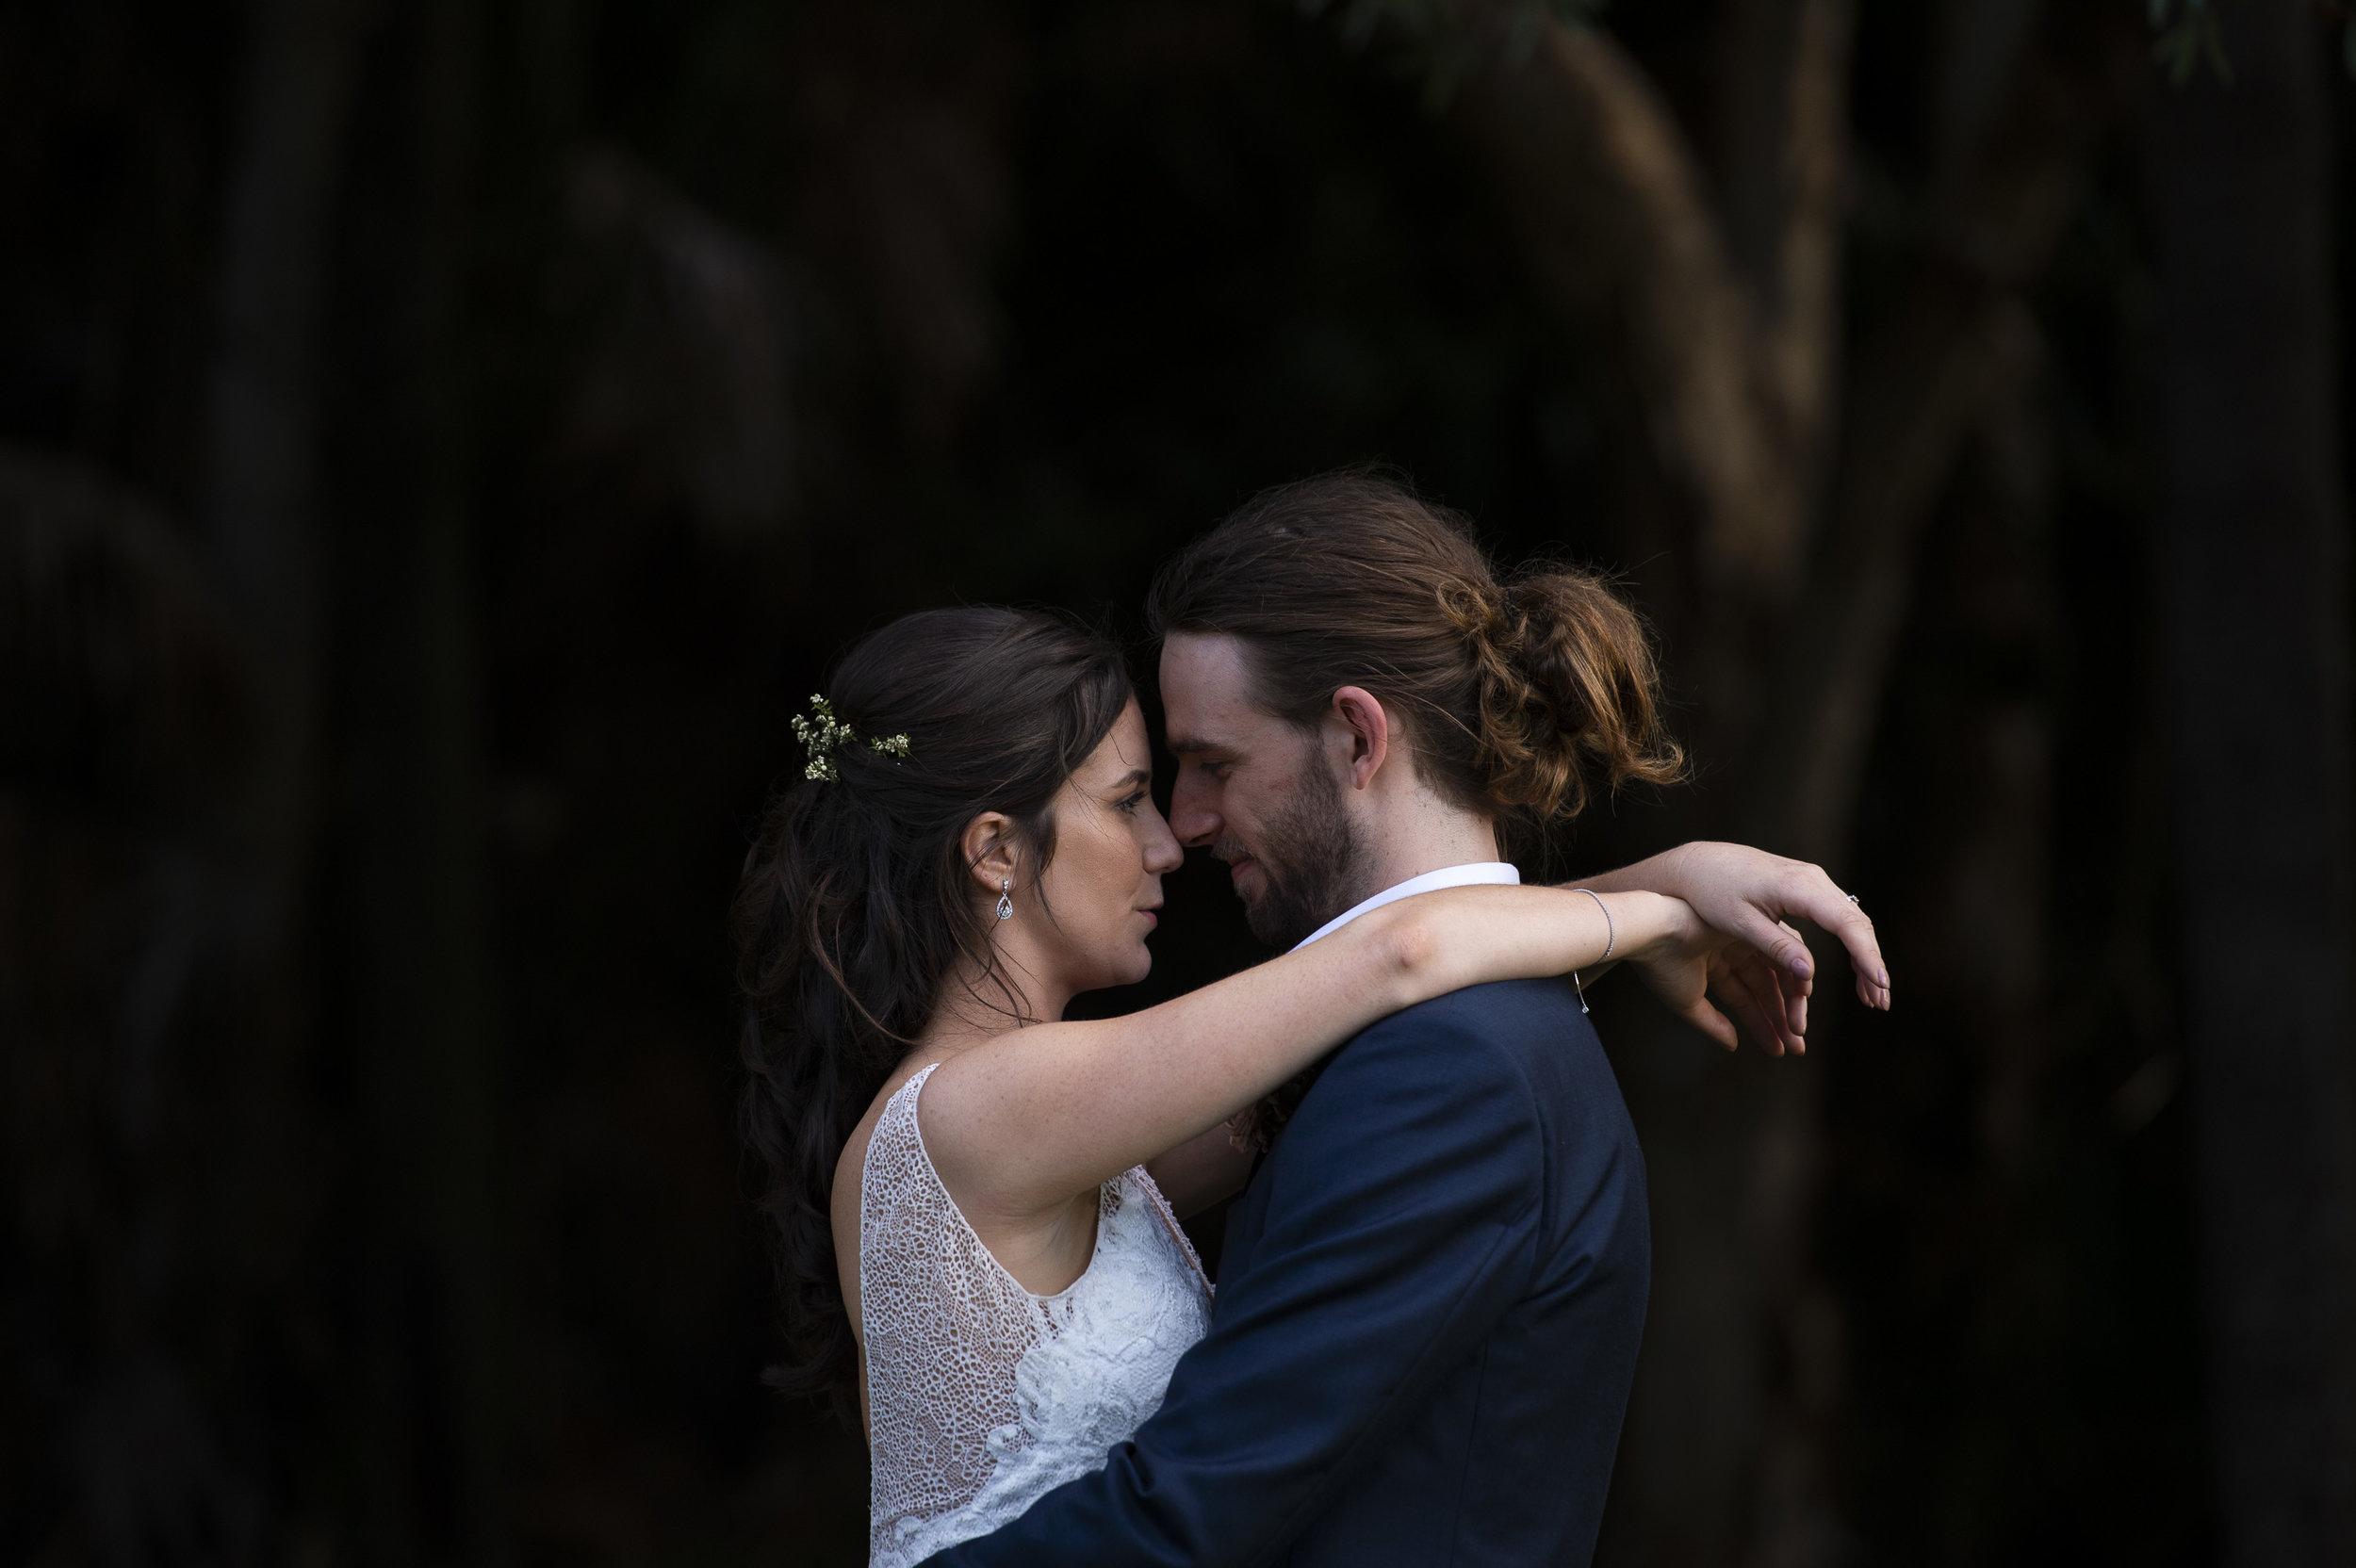 weddings+by+atelier+photography-wedding-26.jpg